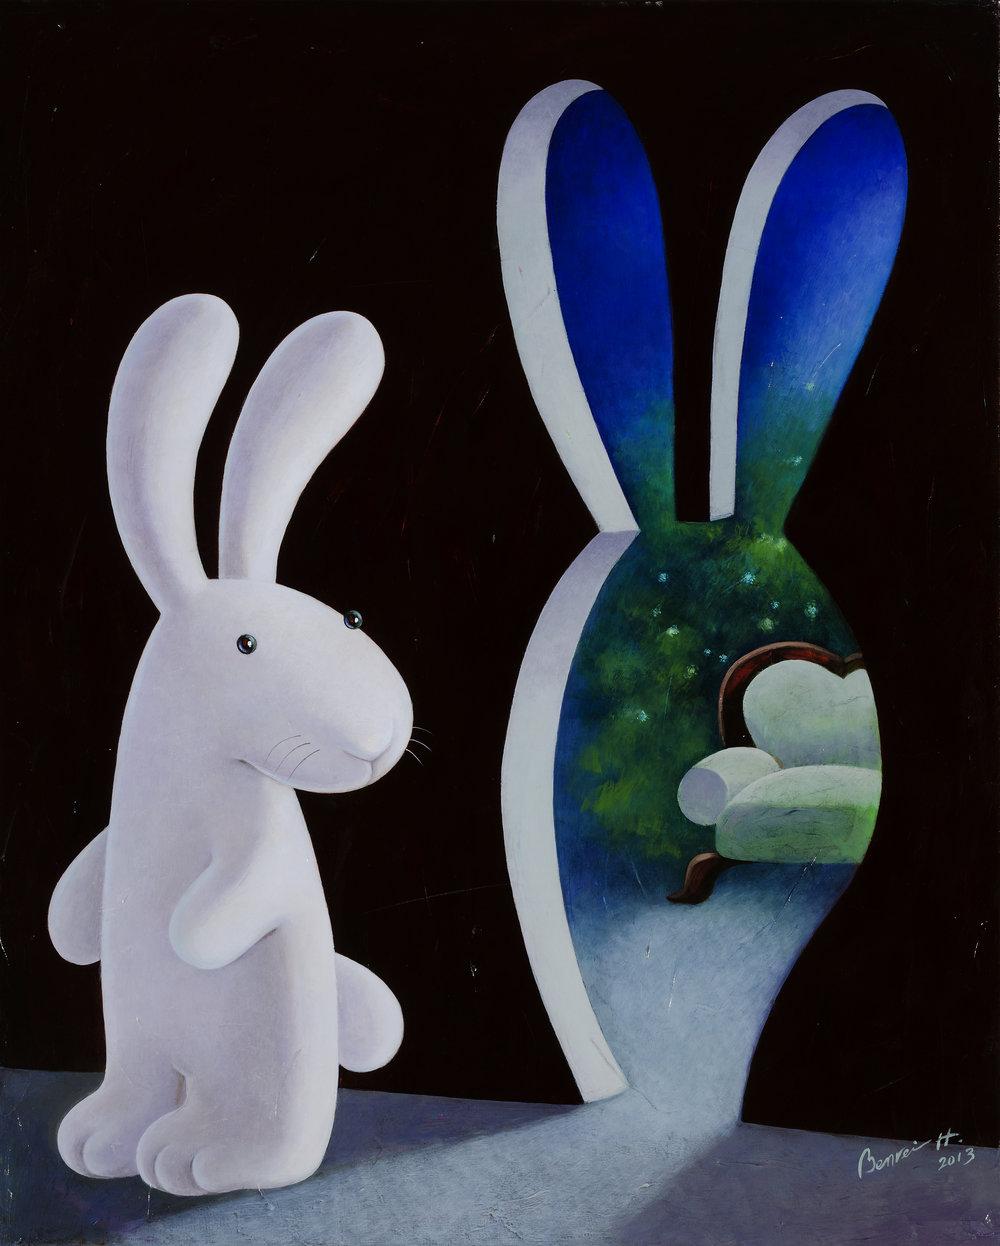 This way to bunny lounge 貴賓室專用入口